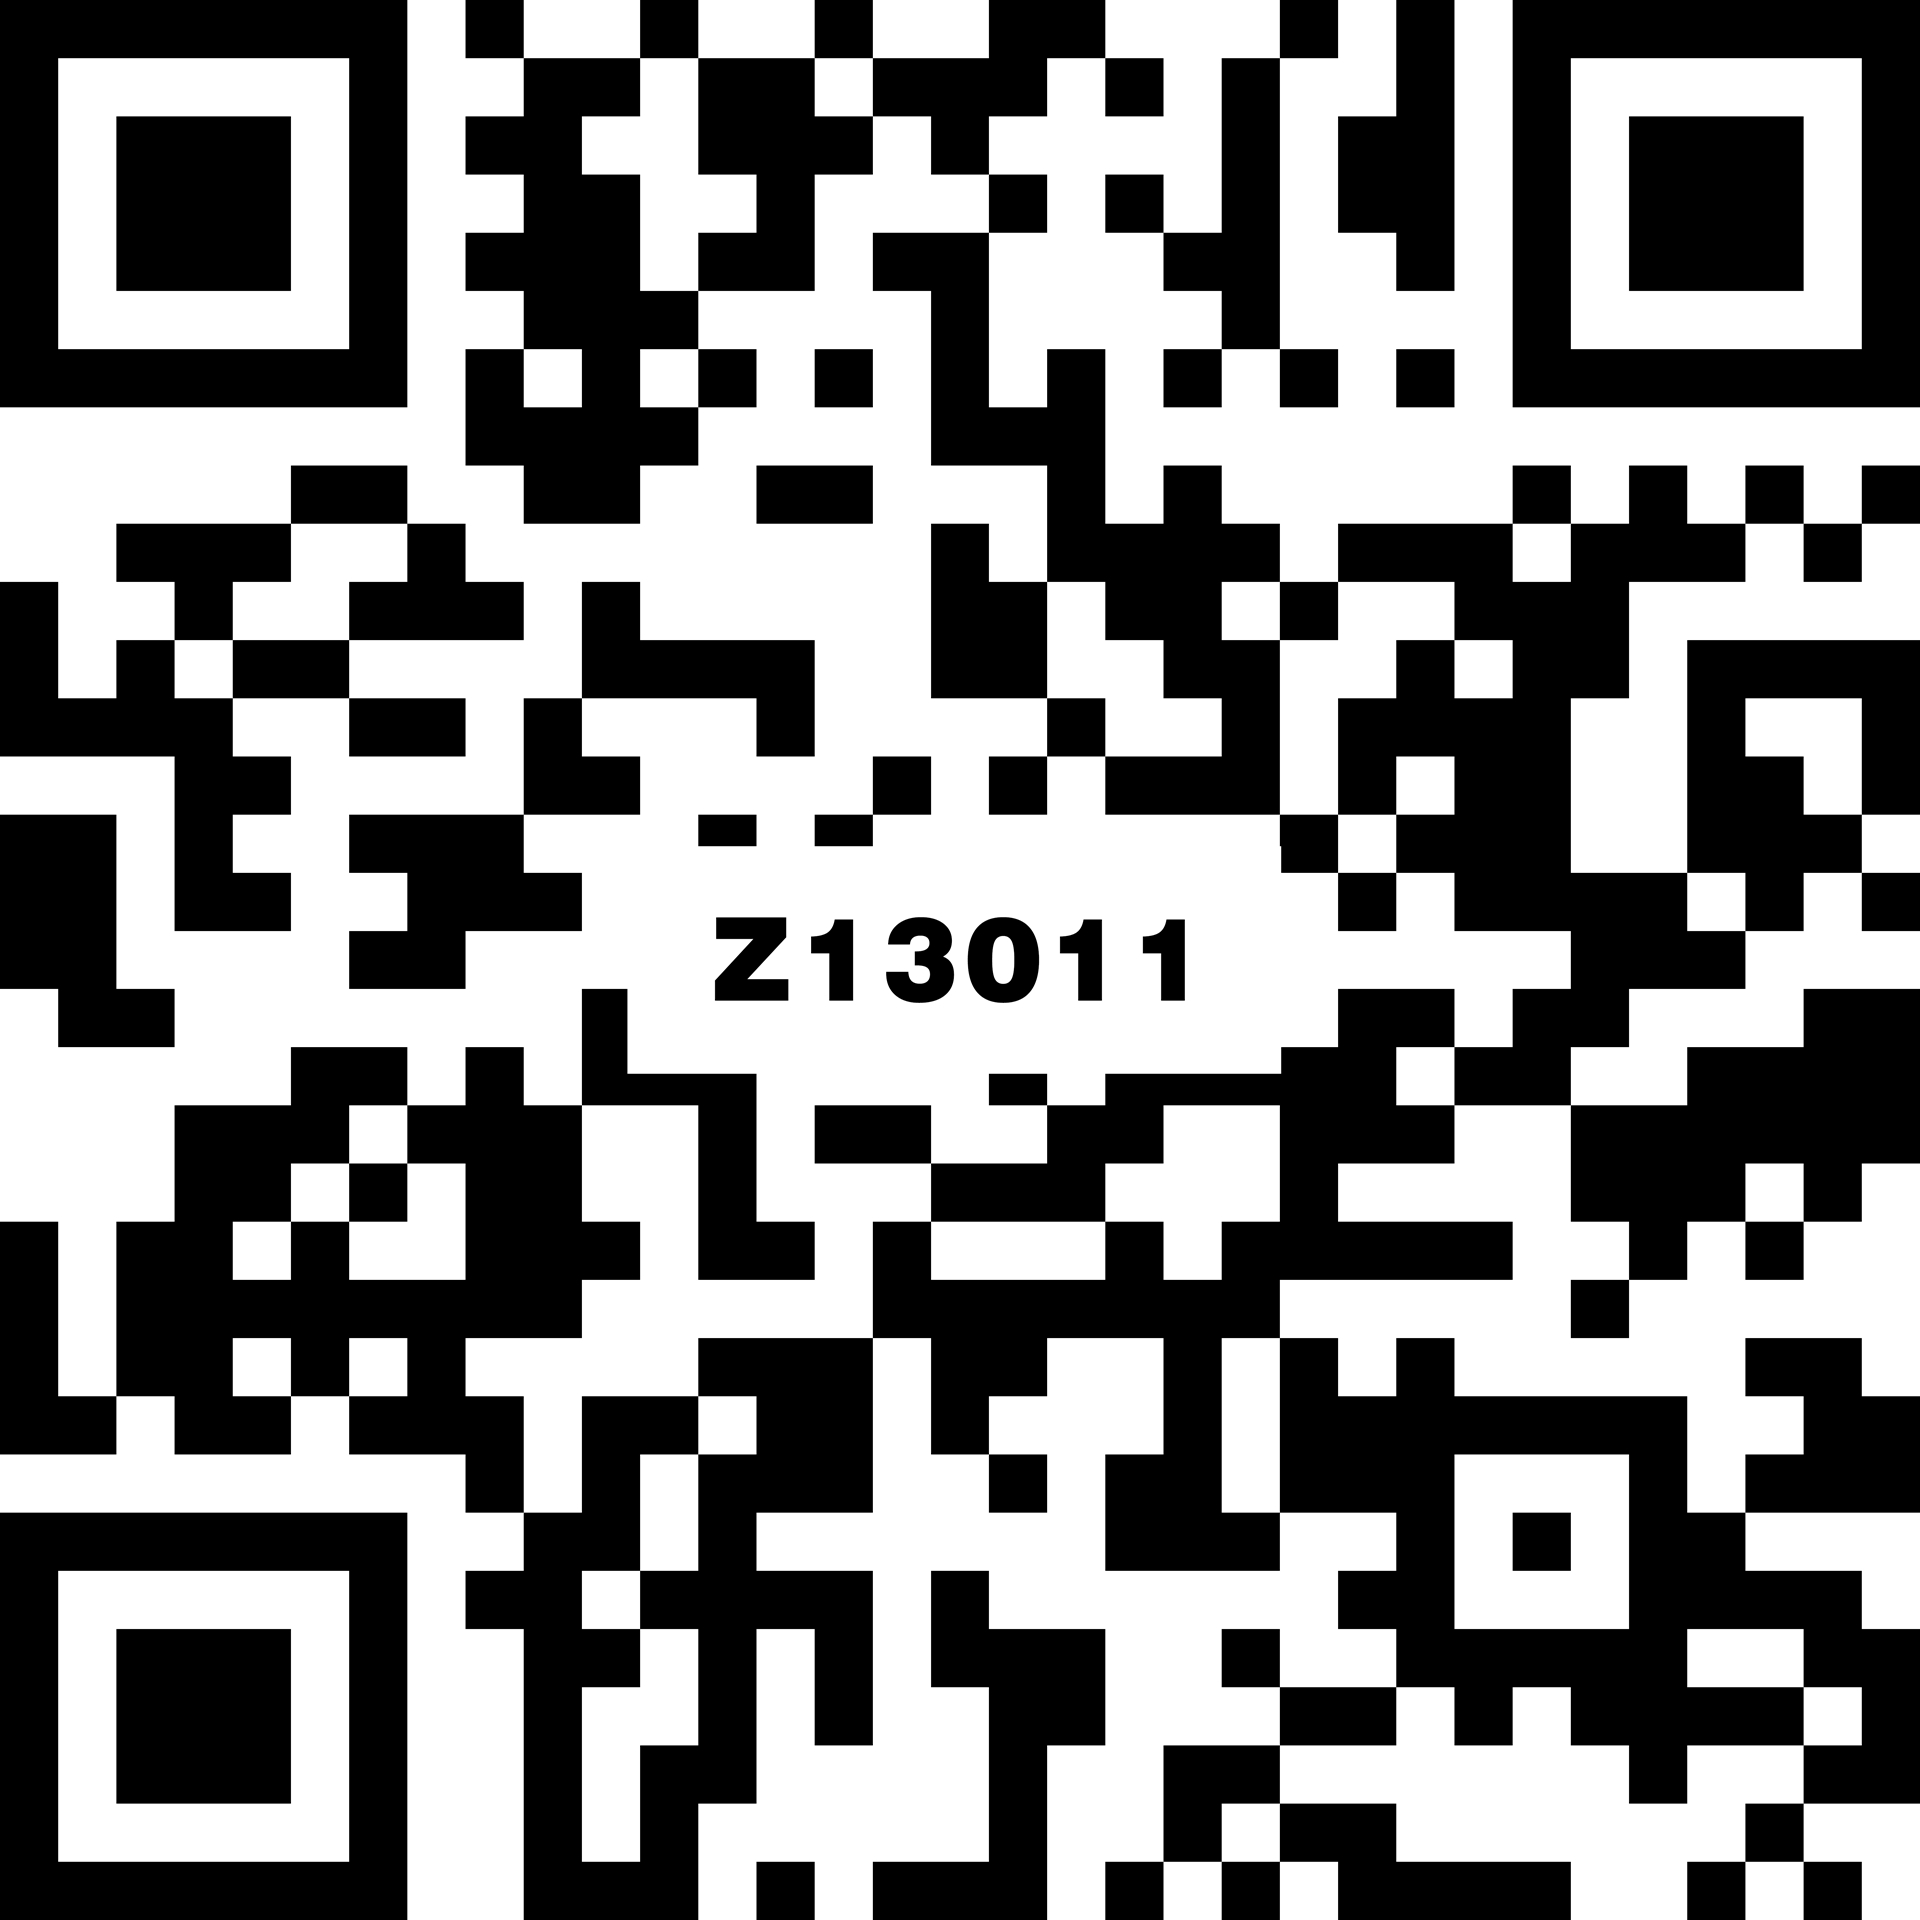 Z13011